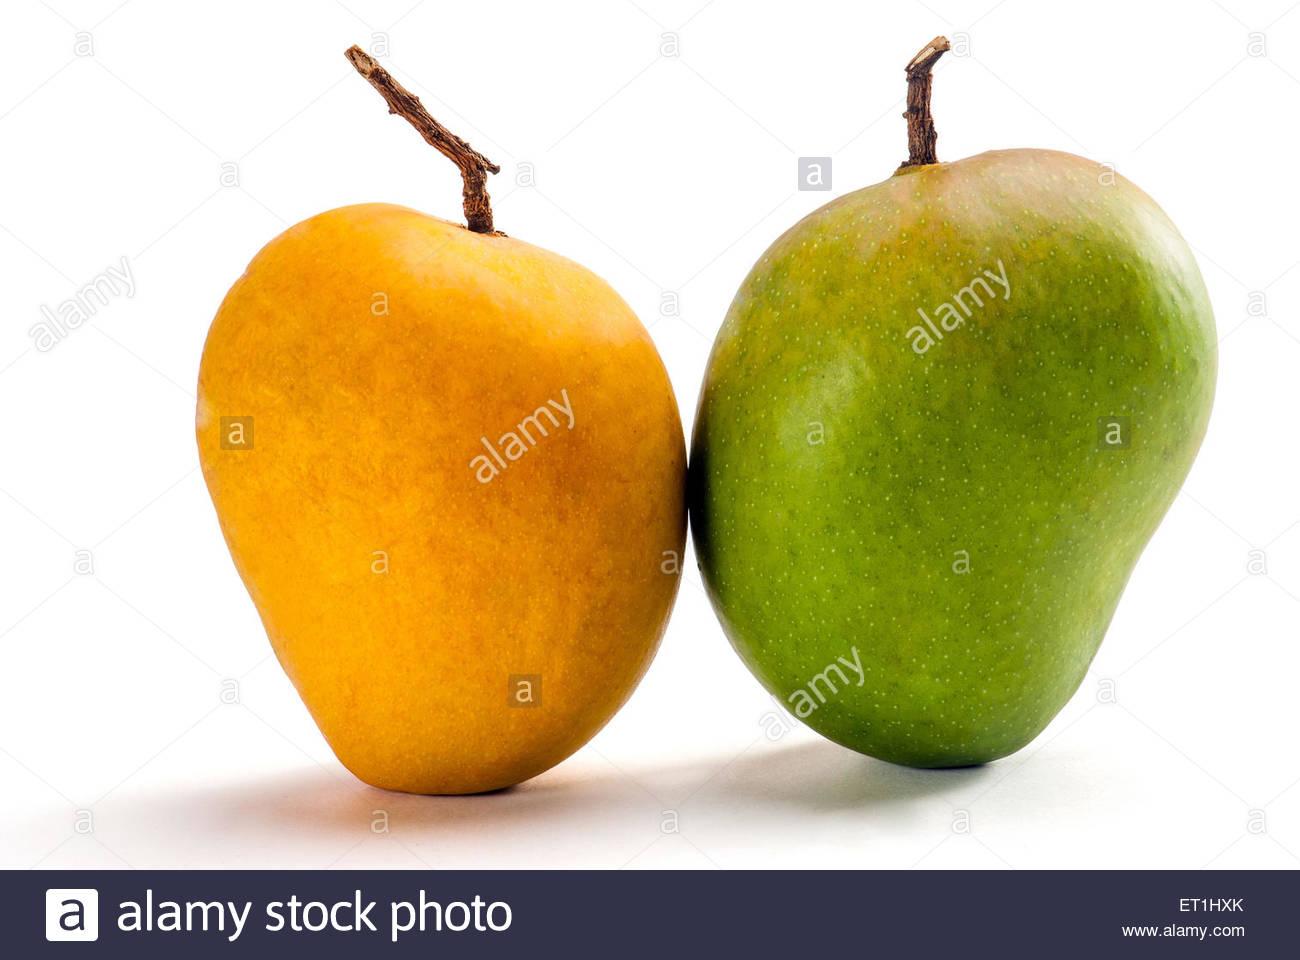 alphonso mango also hafoos hapuz or aapoos ET1HXK